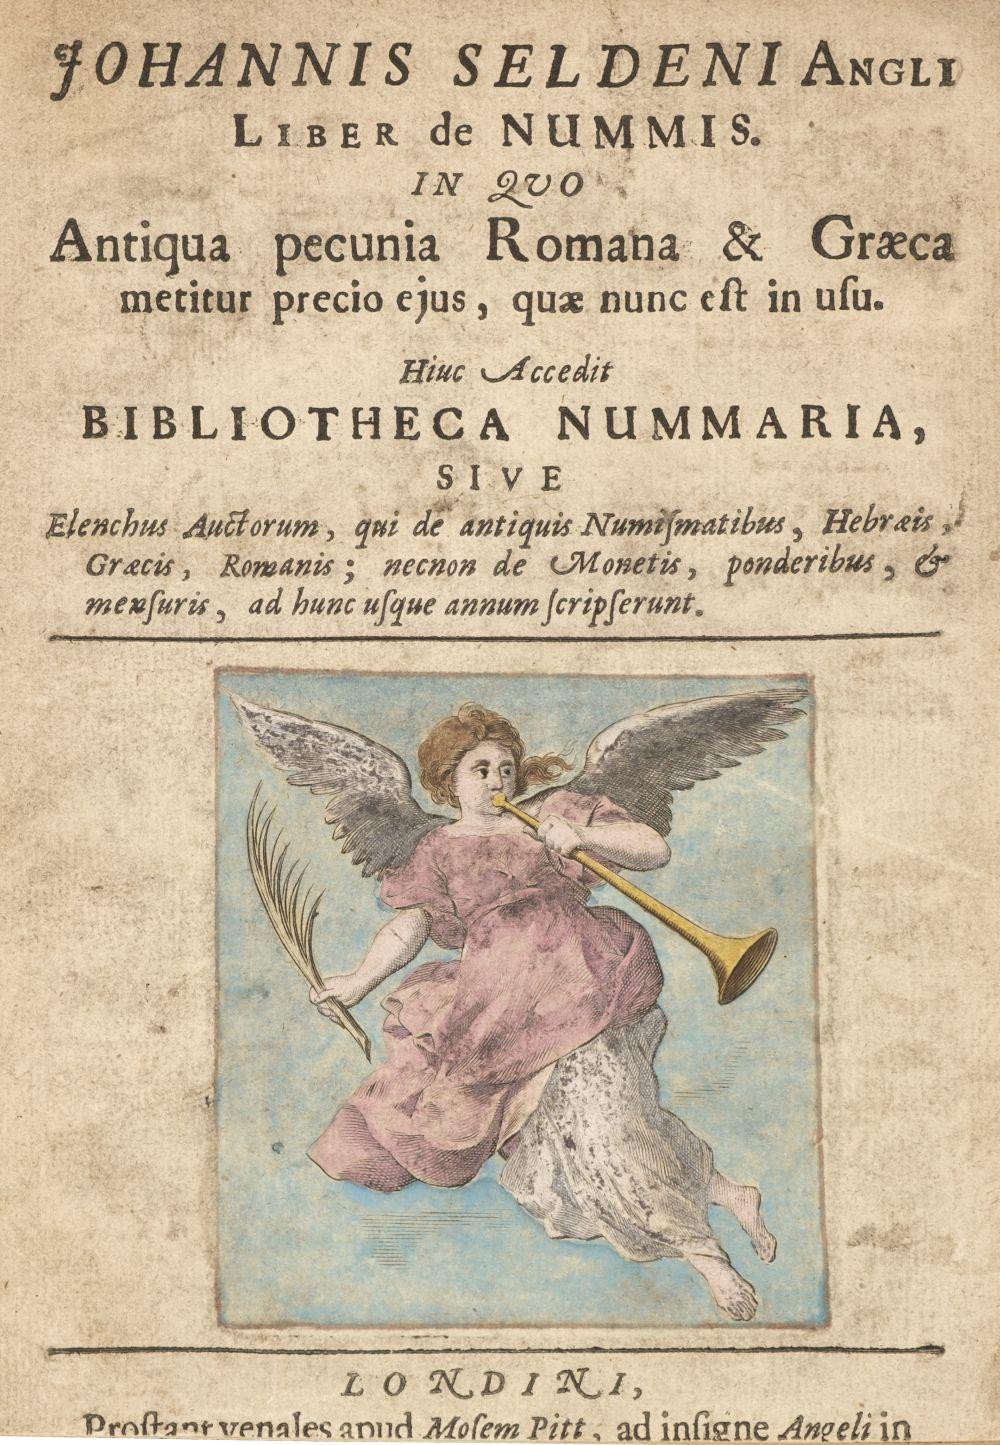 Sardi, Alessandro. Liber de nummis:, 2 parts in one volume, Moses Pitt, [1675]